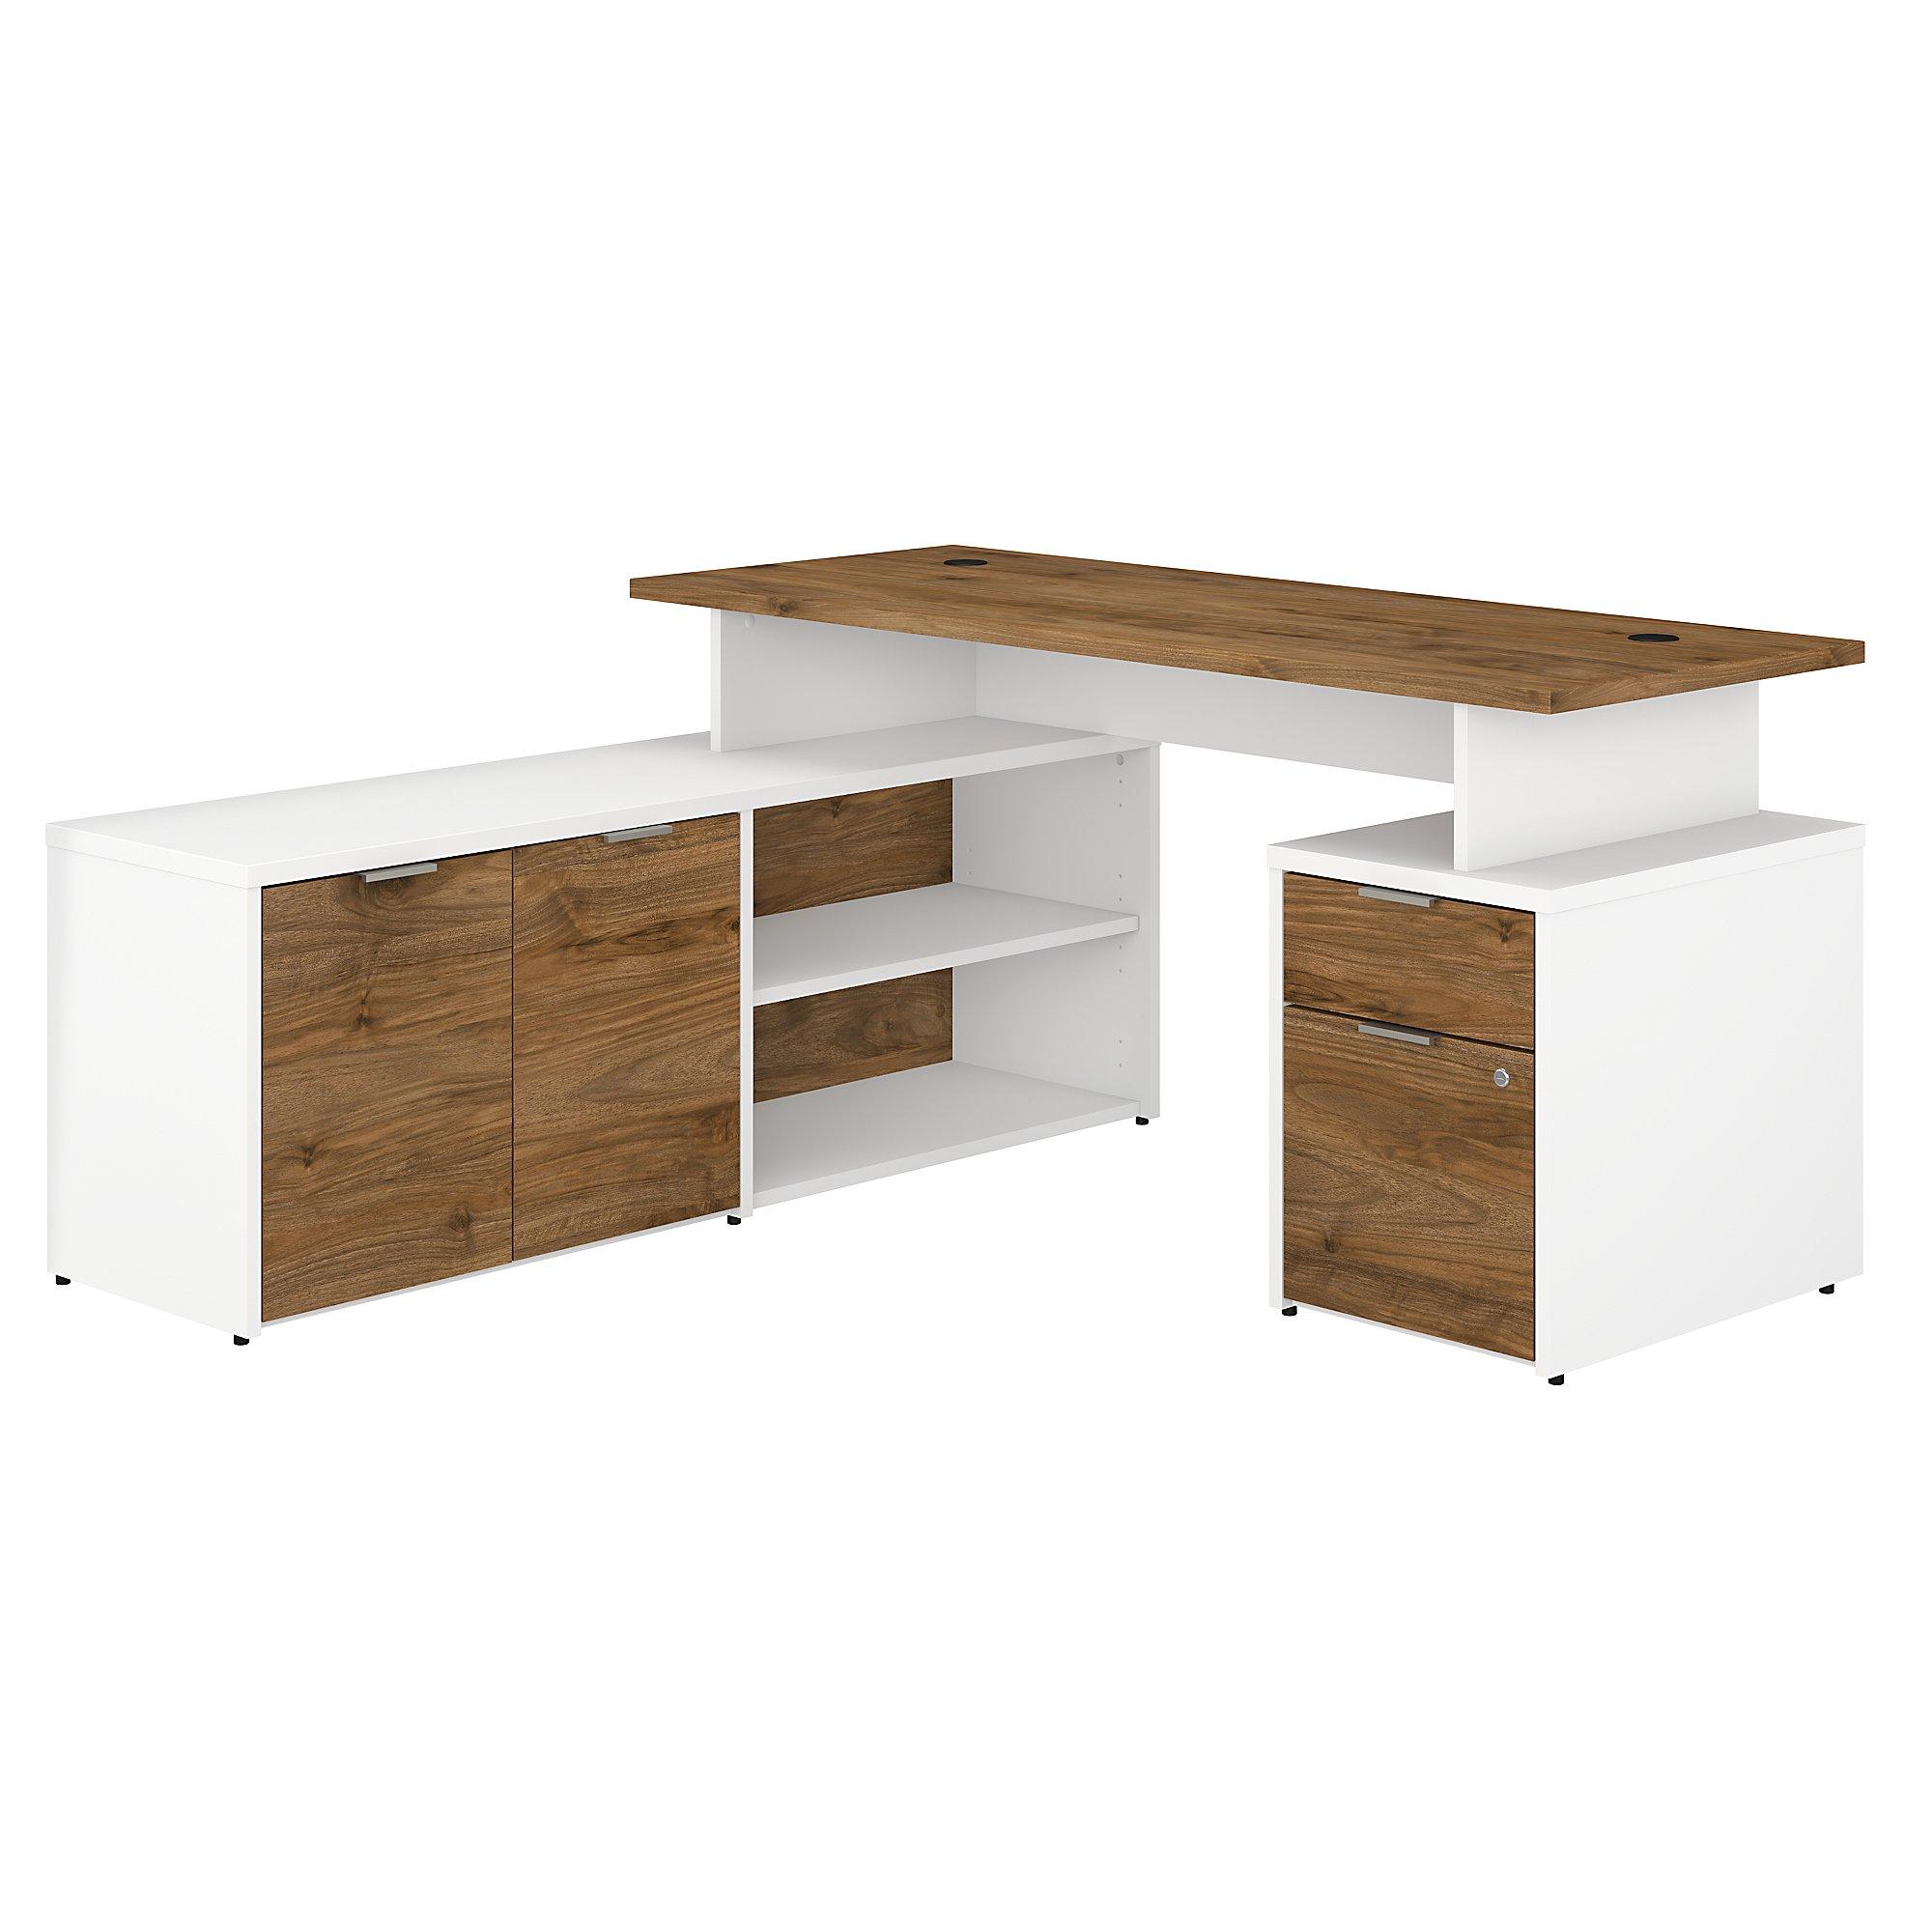 jtn021 jamestown l-desk with fresh walnut and white finish